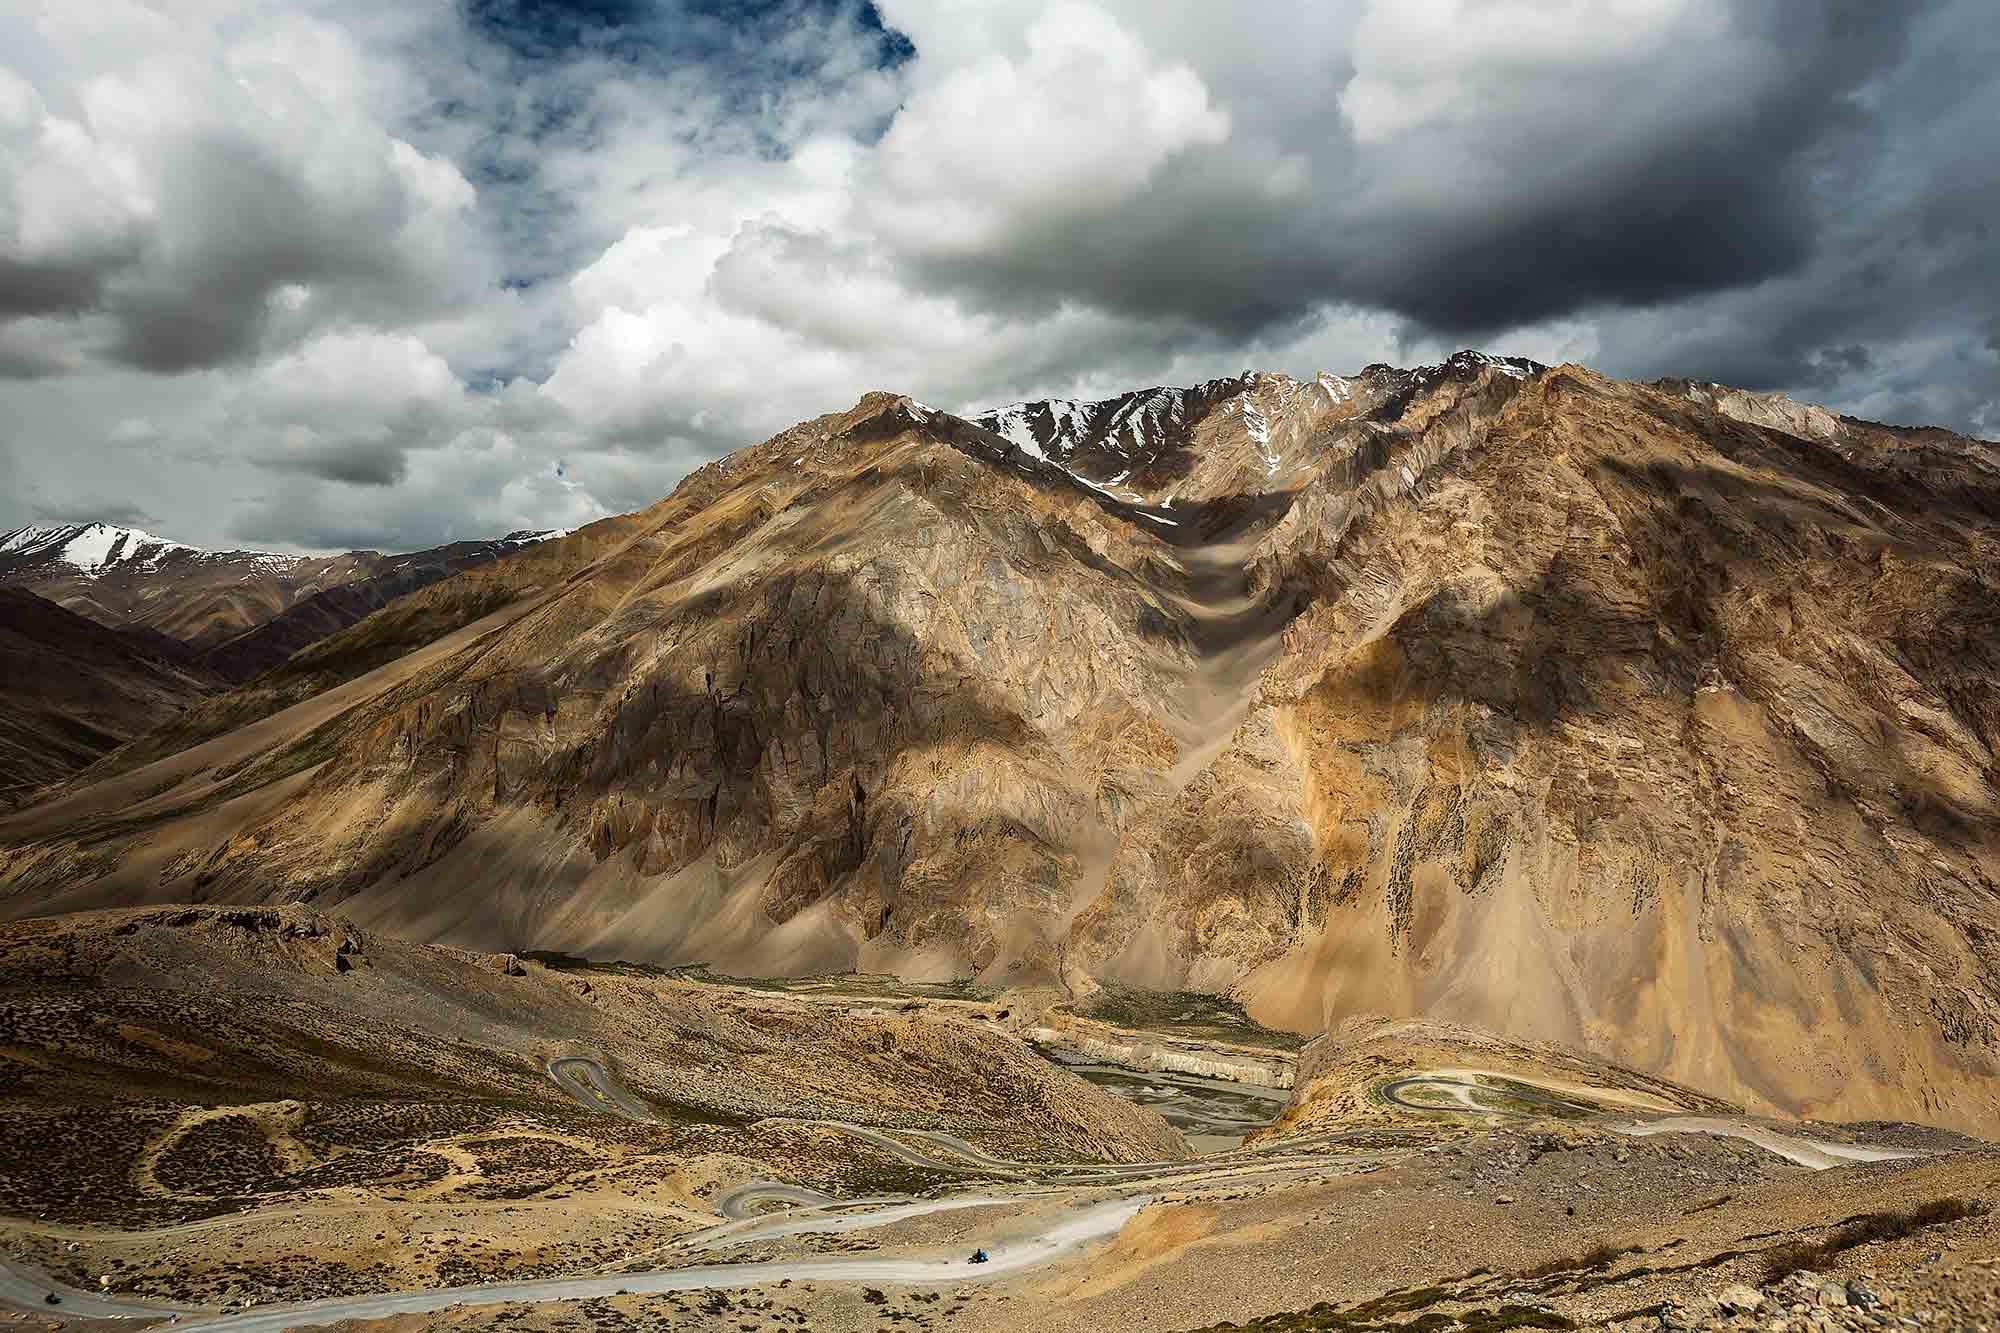 leh-manali-highway-kashmir-ladakh-himalayas-india